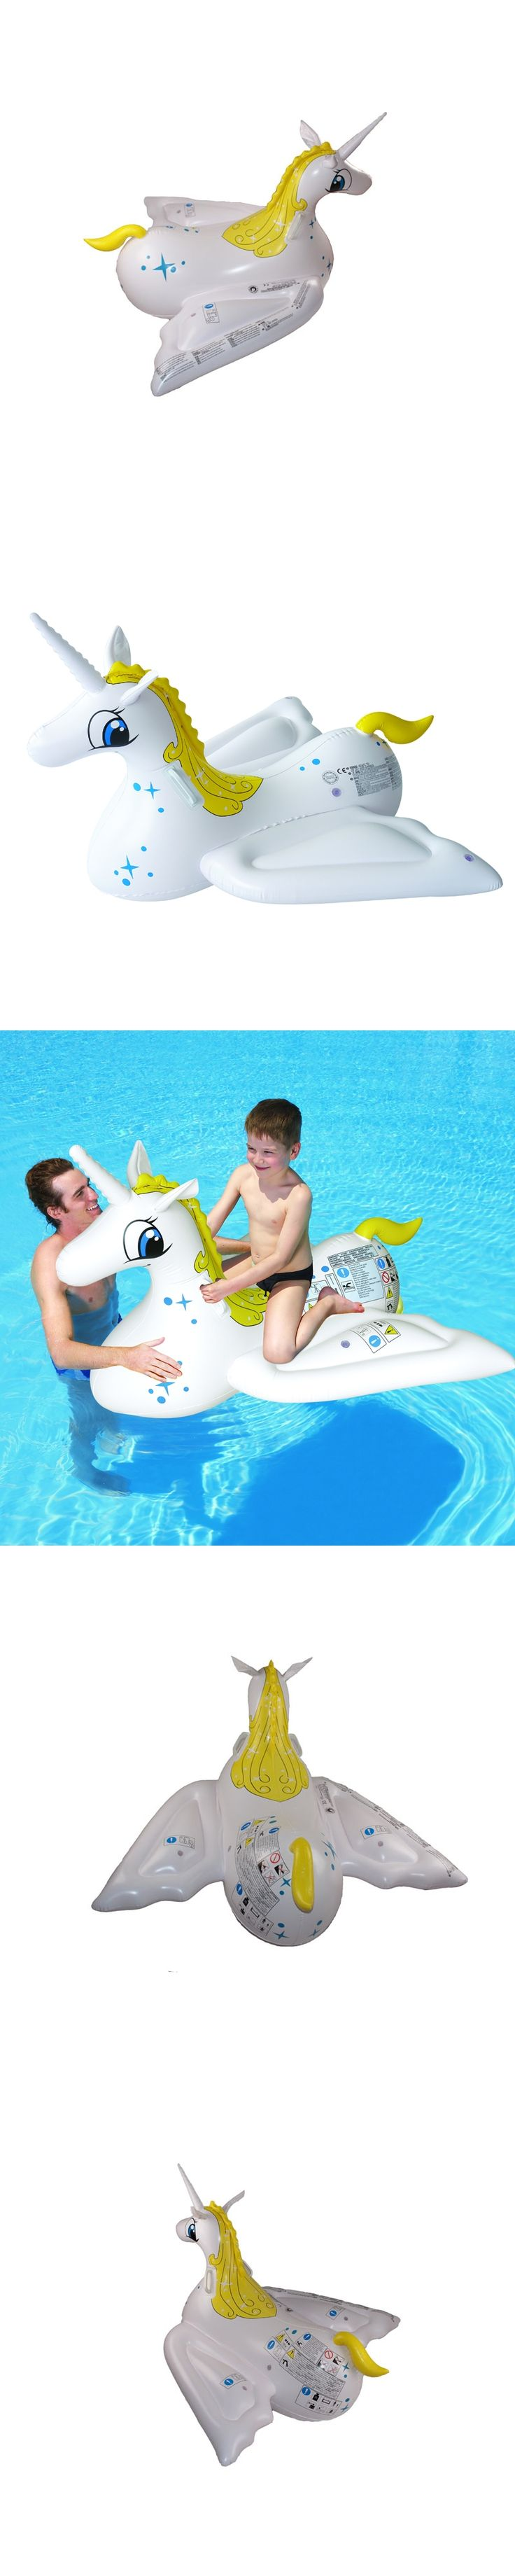 112132cm inflatable water pegasus fly horse rider animal rider baby rider swimming pool toy - Hinterhoflandschaftsideen